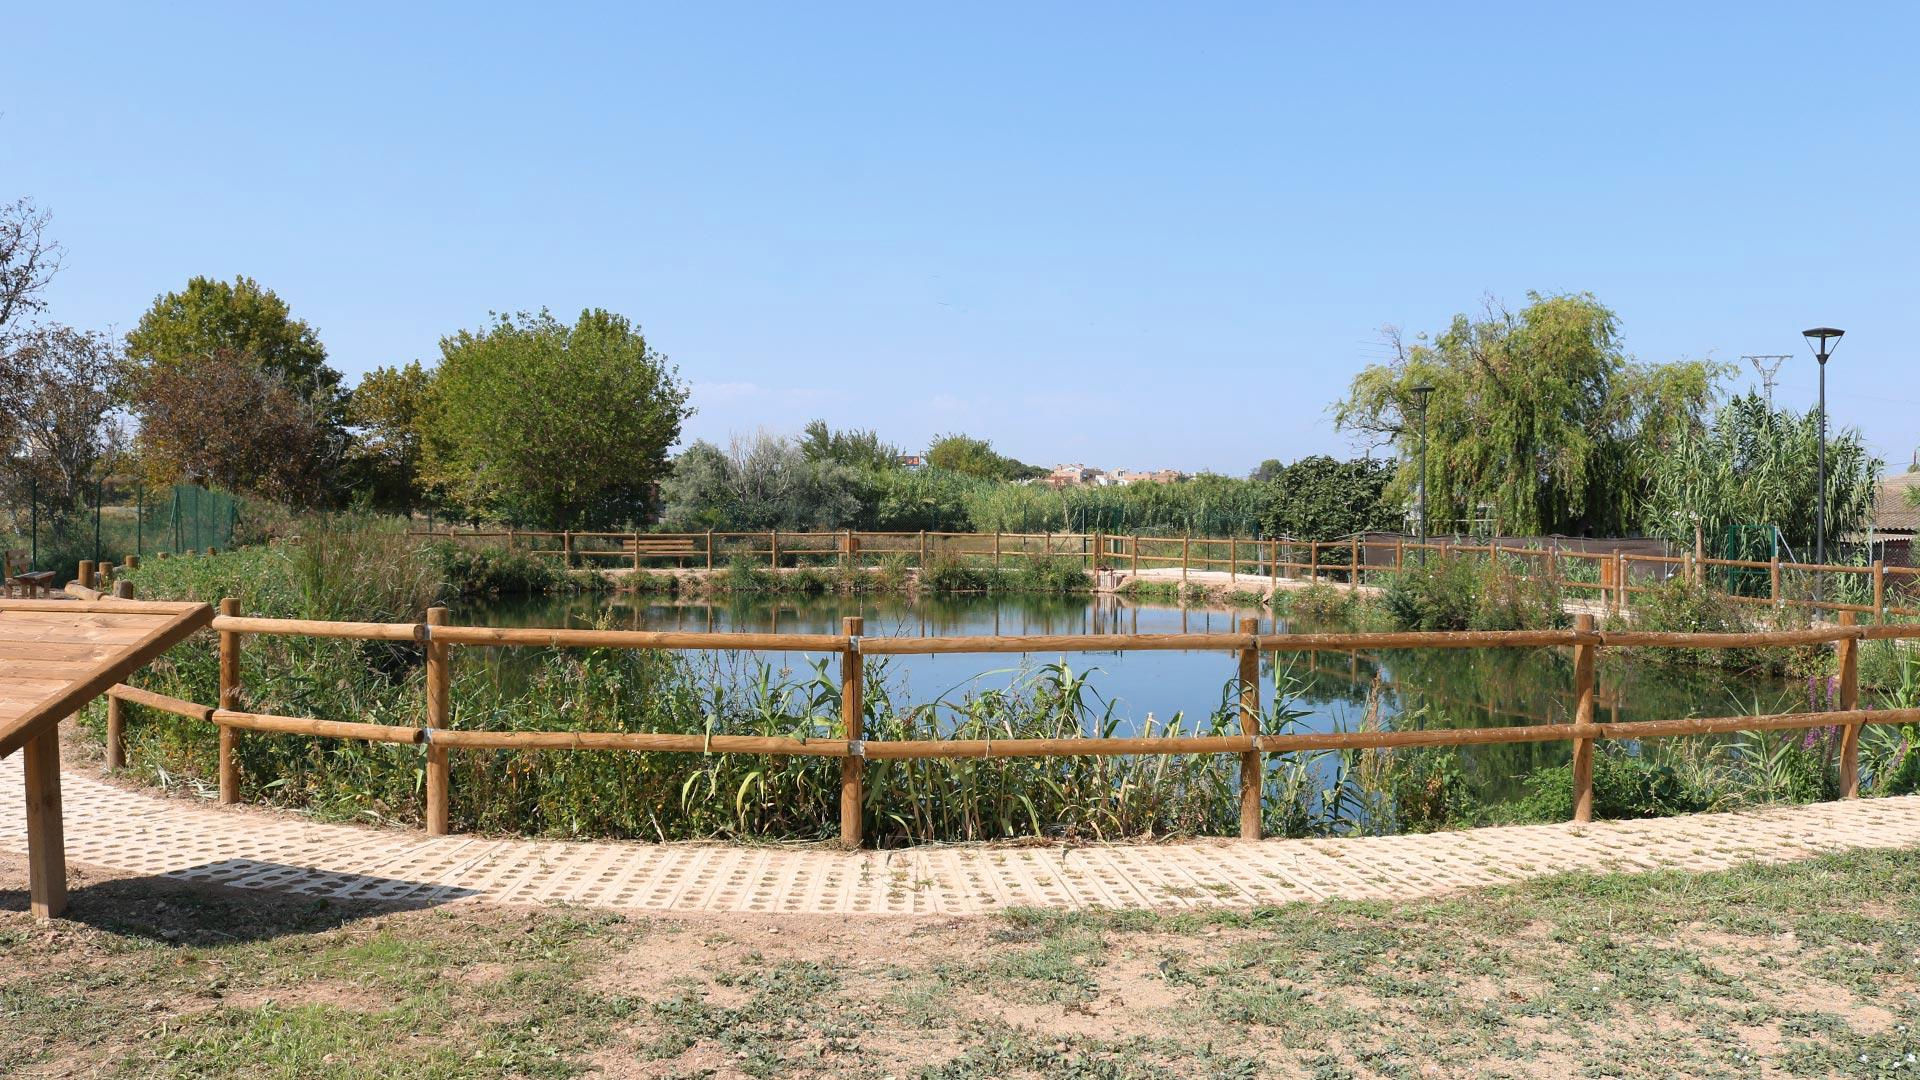 Vista completa de la balsa de Marlofa de La Joyosa en la Ribera Alta del Ebro